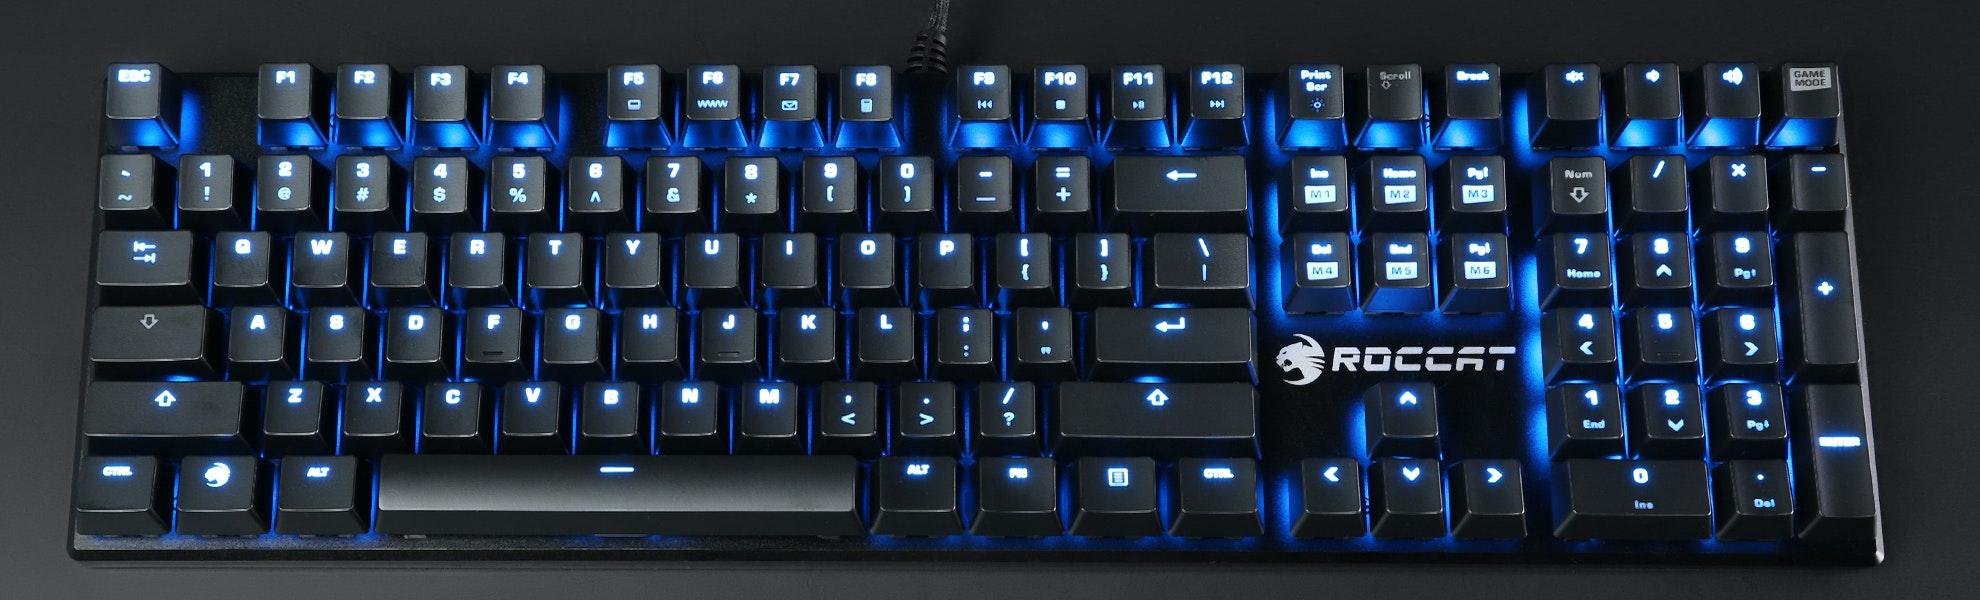 Roccat Suora Frameless Mechanical Keyboard Bundle